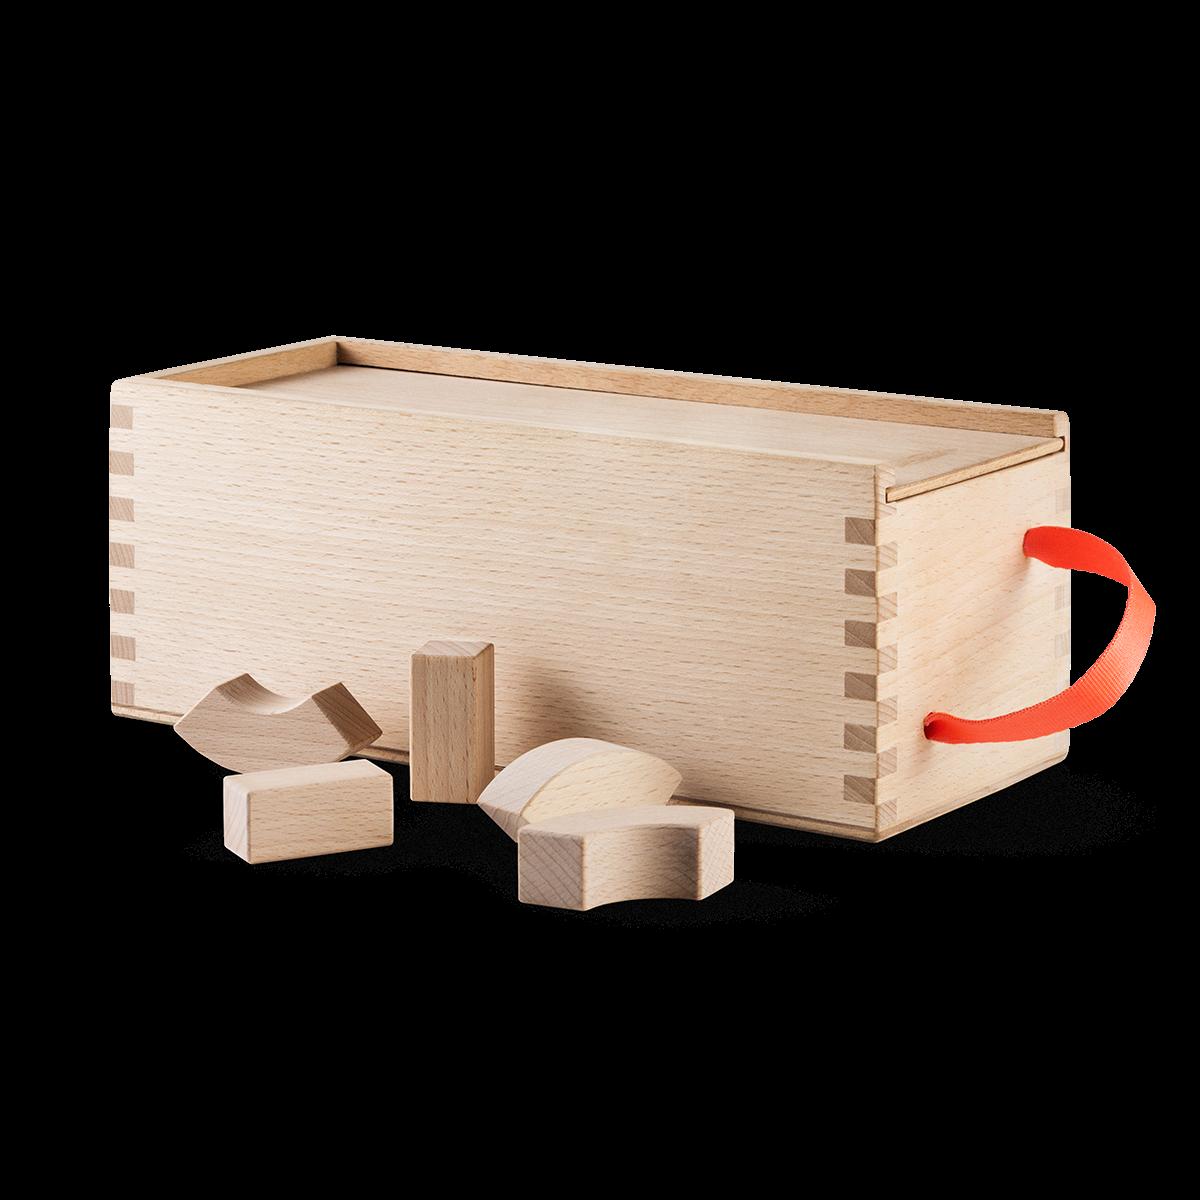 kisspng-toy-block-kltze-alphabet-wooden-block-5b1e0e20e35bf4.8781940815286963529313